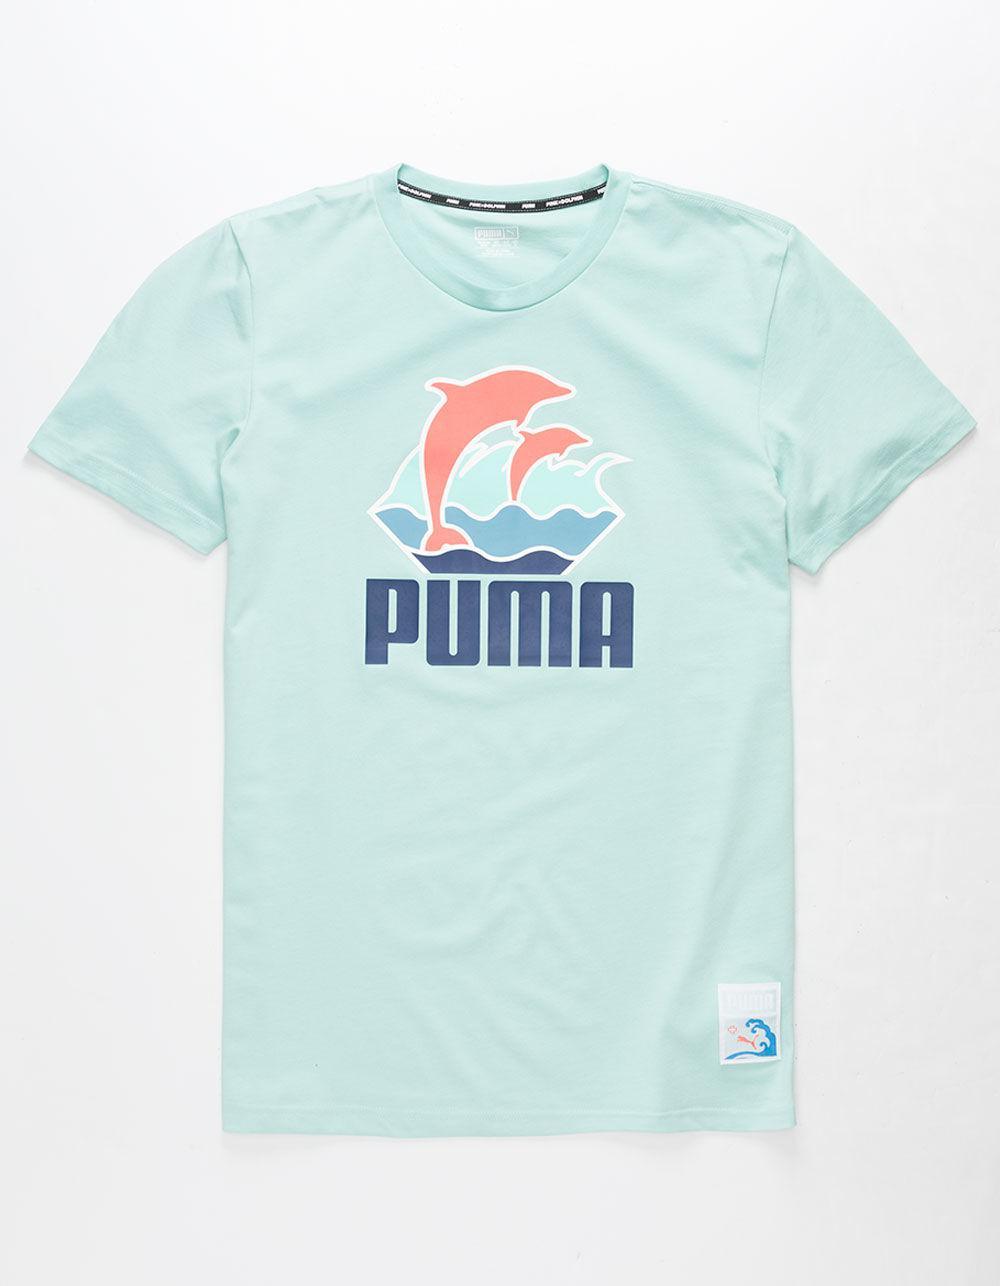 312f47b08017 Lyst - PUMA X Pink Dolphin Promo Mens T-shirt in Blue for Men